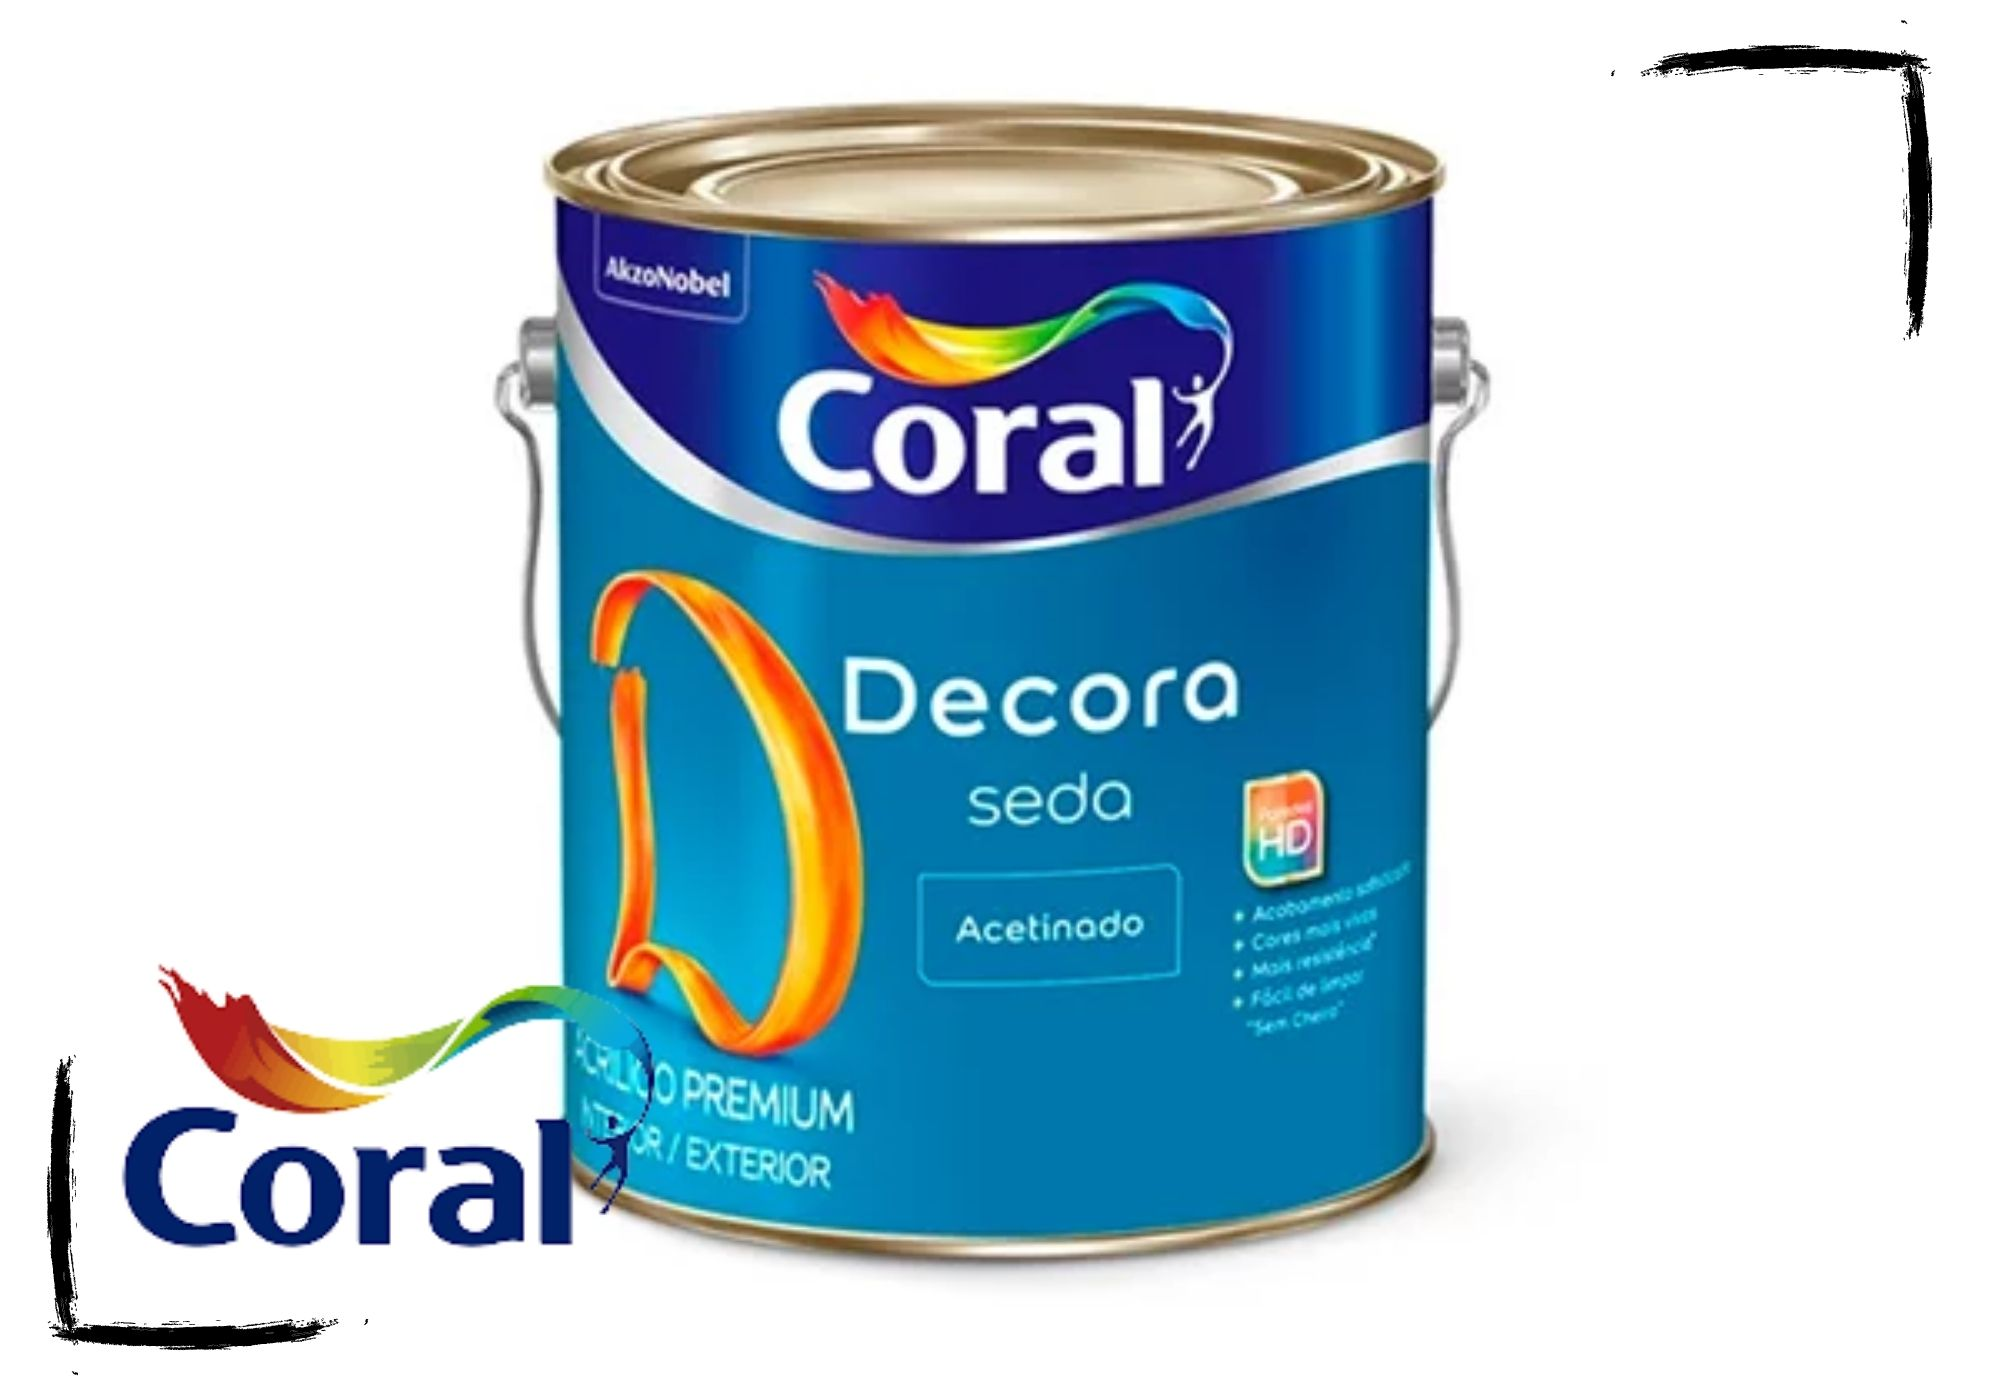 Coral Decora Acabamento Seda 3,6L